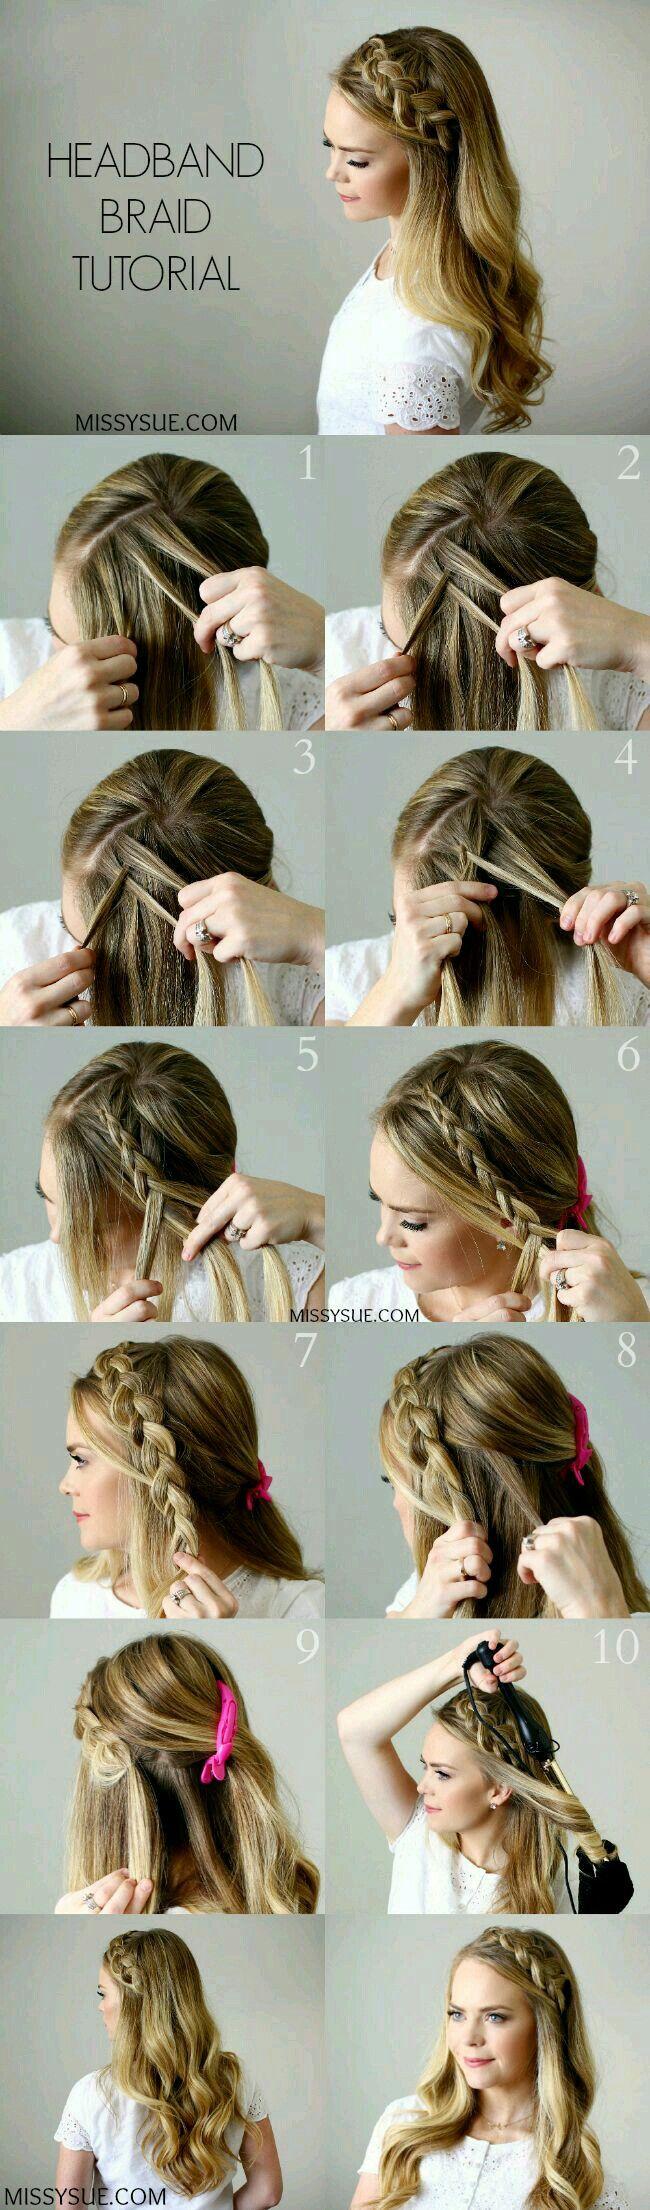 Headband Braid Tutorial Hair Pinterest Hair Styles Hair And